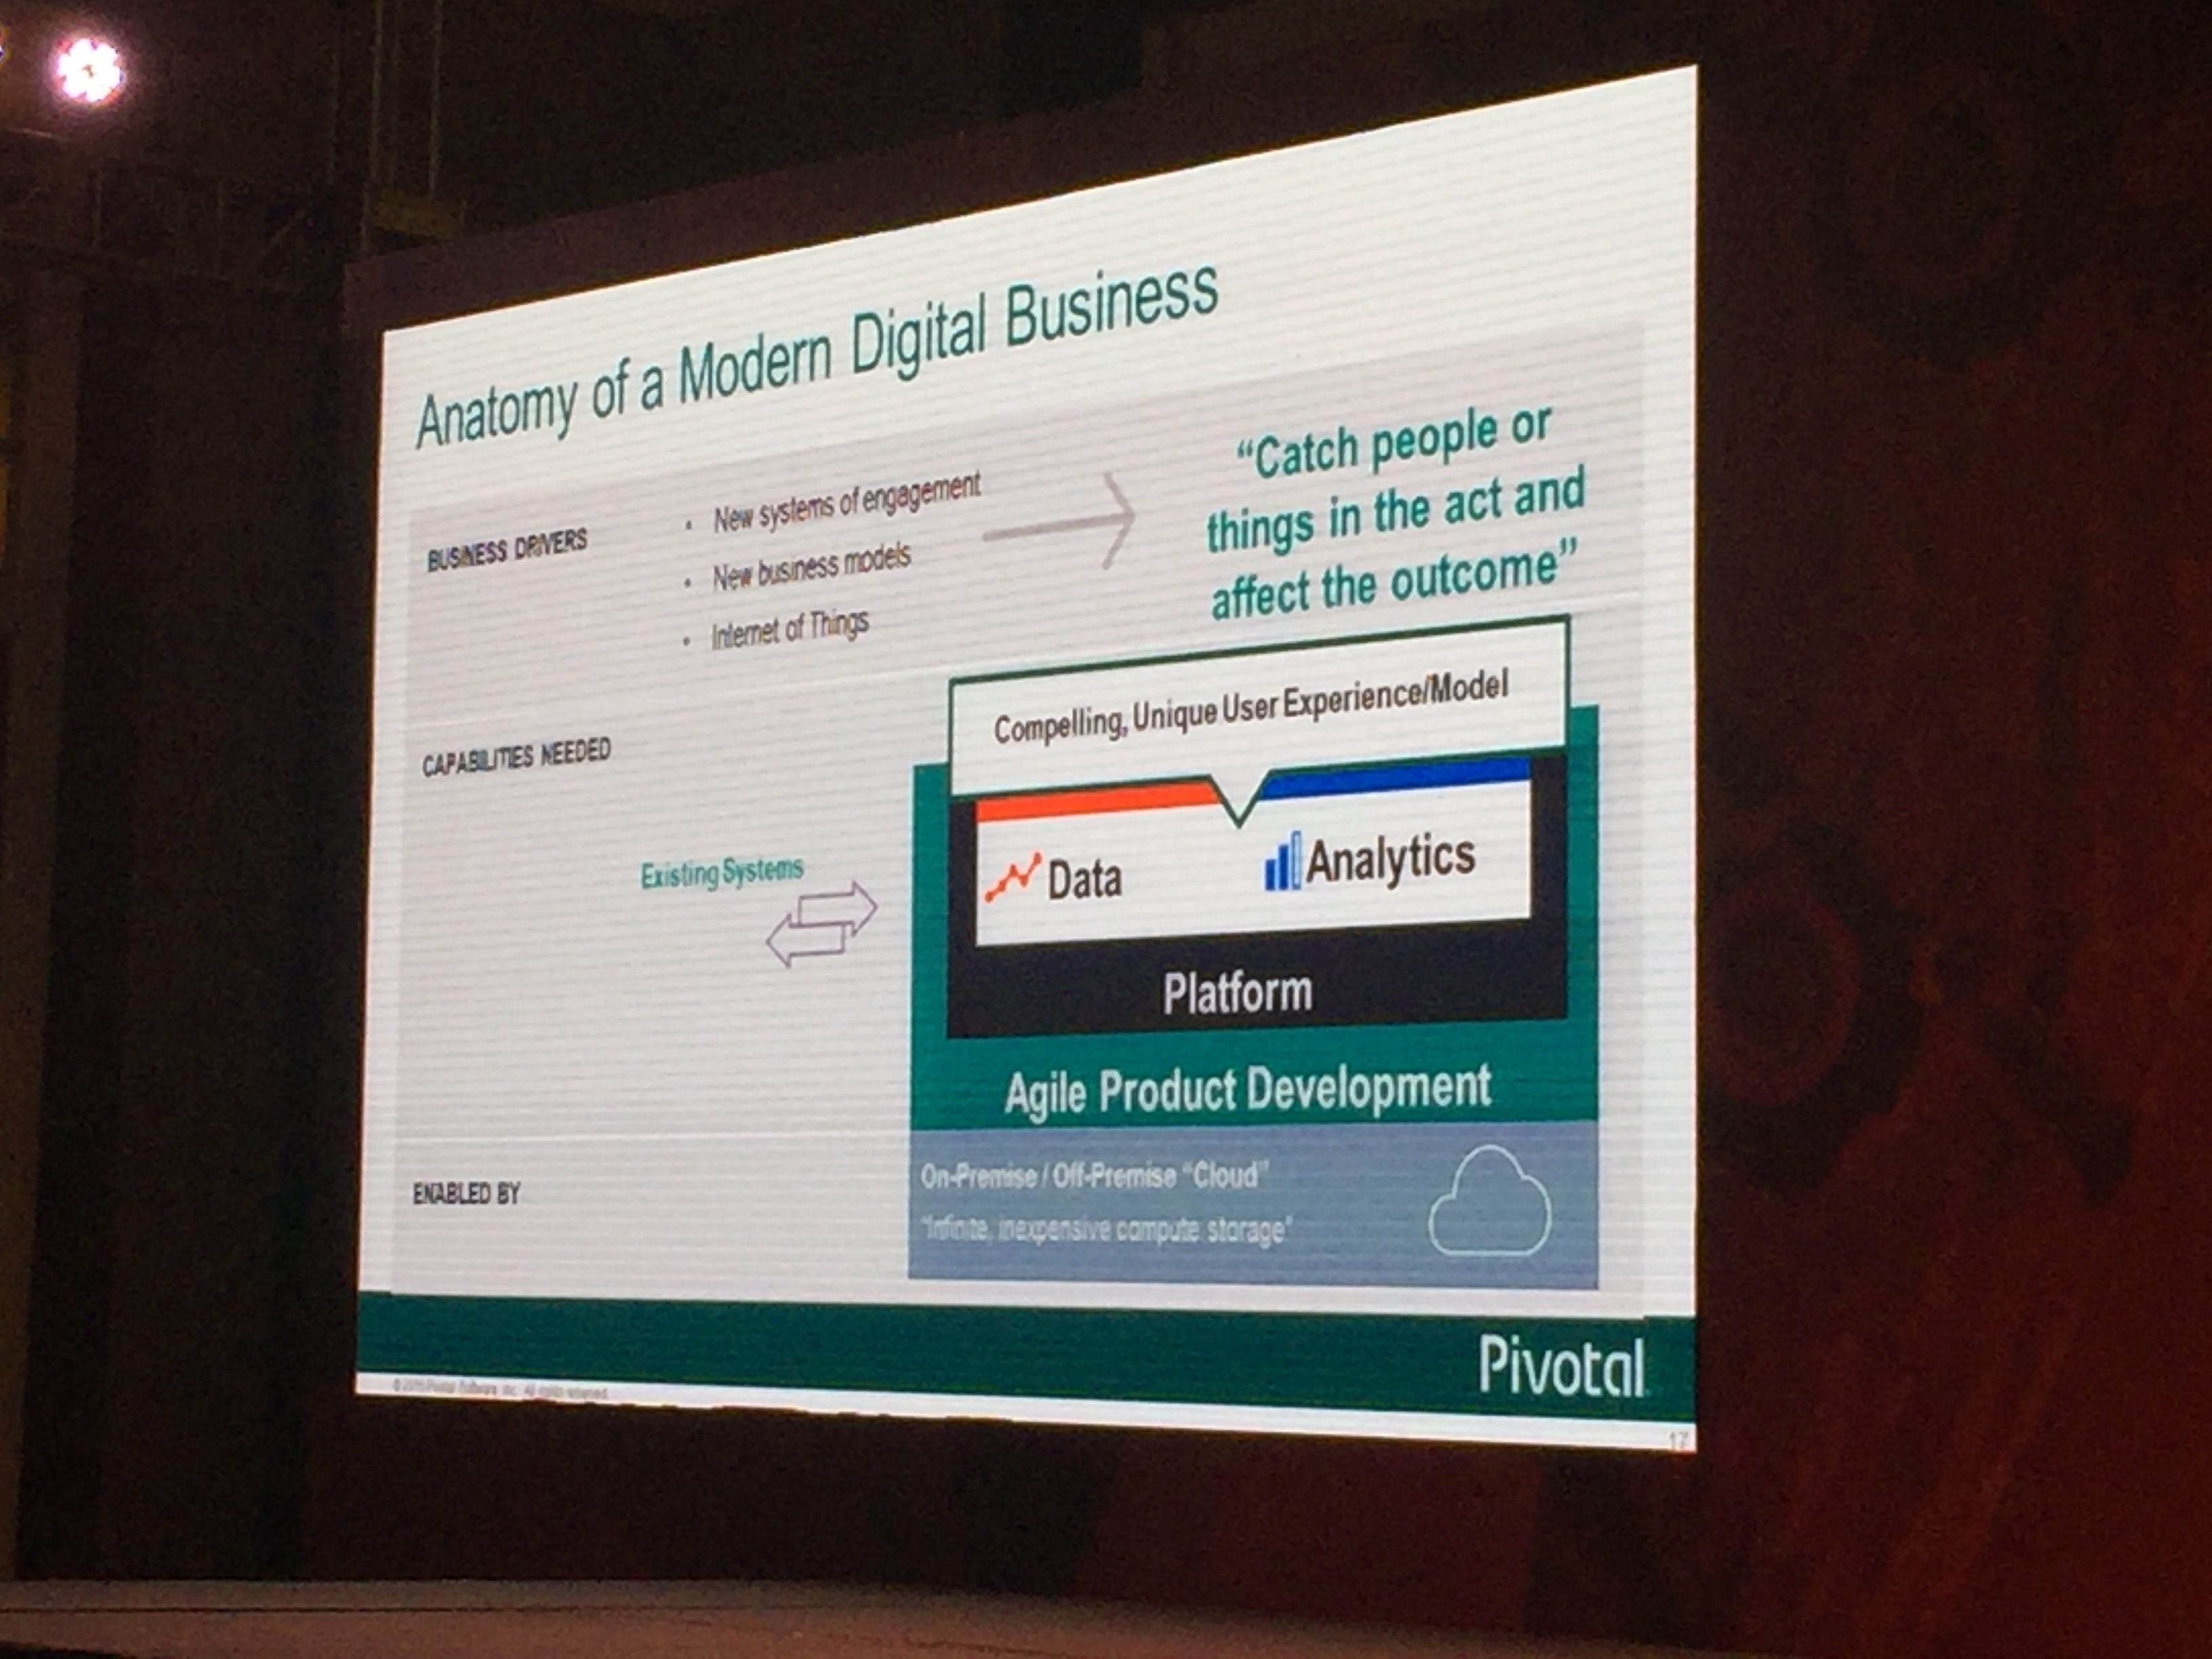 cloud-foundry-summit-asia-2015-anatomy-of-digital-business